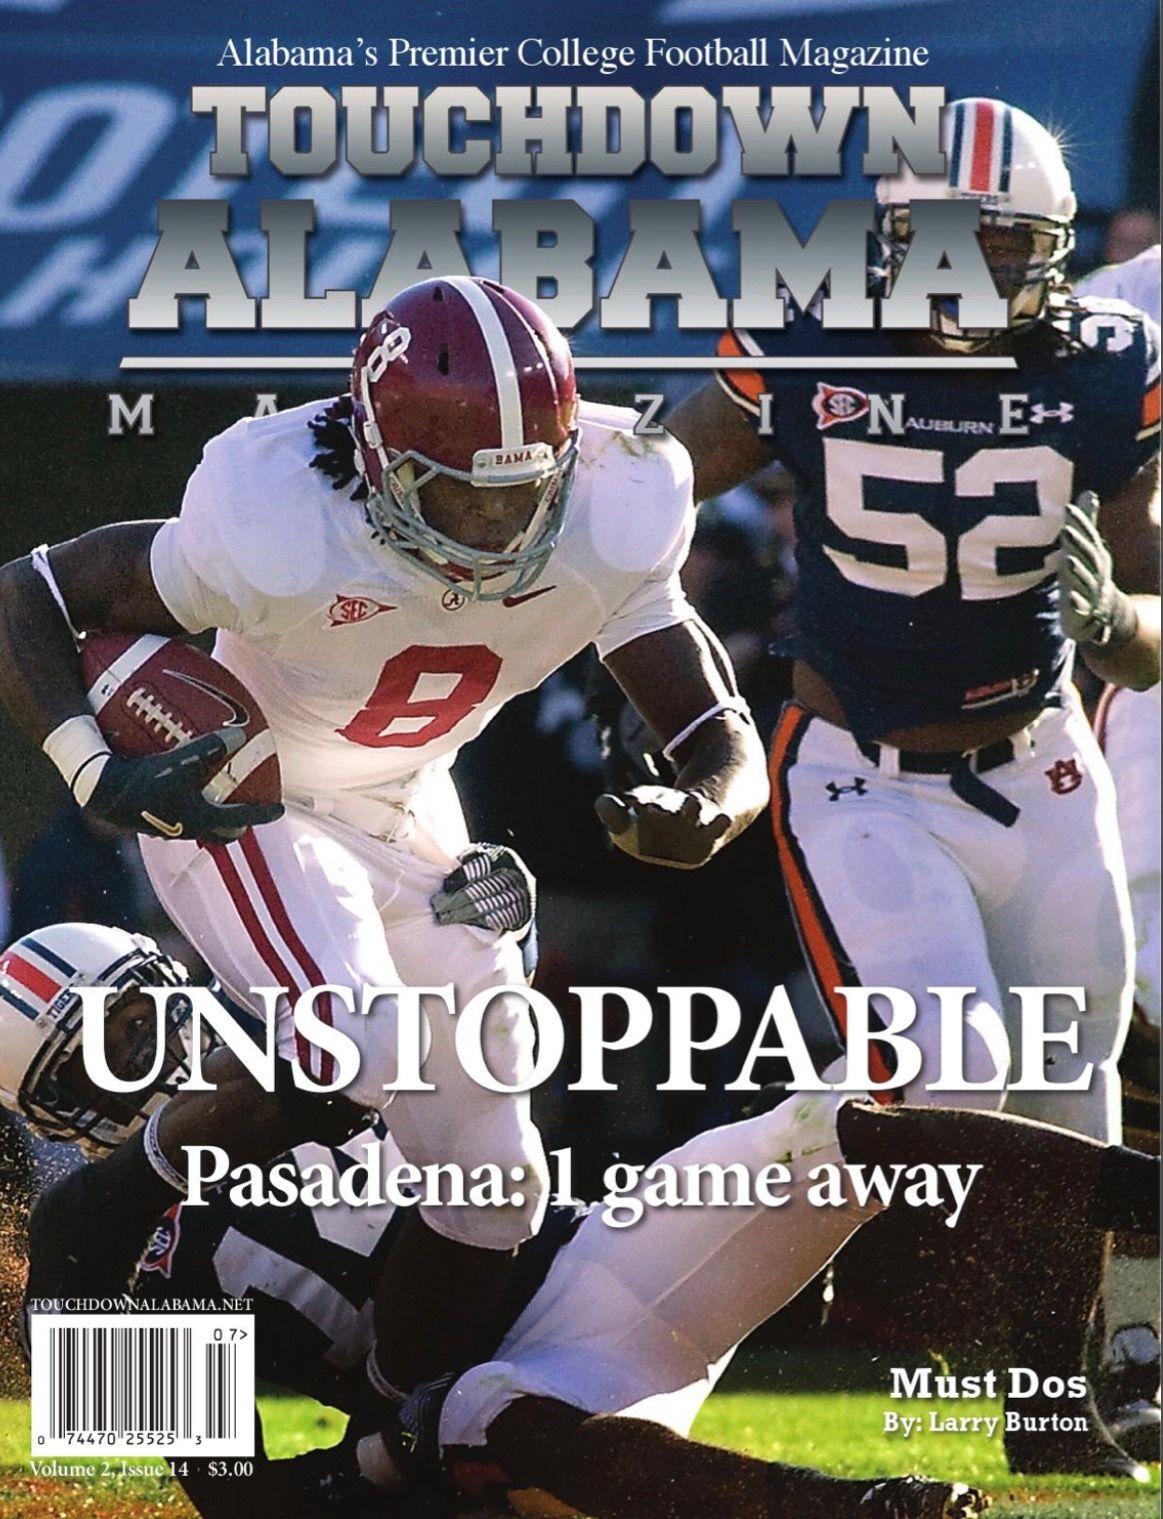 Ea Ncaa Football On Twitter Alabama Crimson Tide Football Crimson Tide Football Alabama Crimson Tide